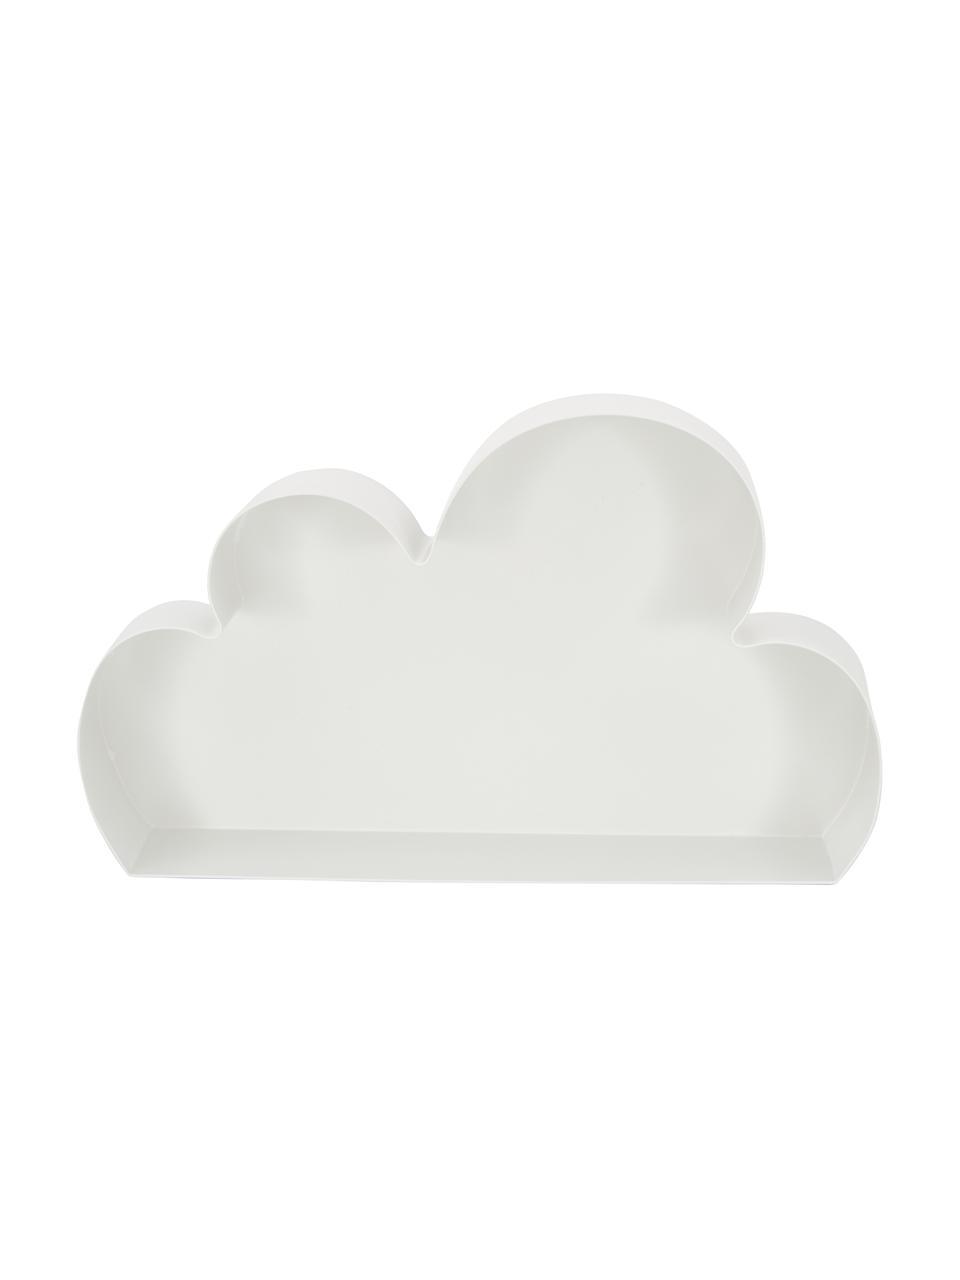 Wandregal Cloud, Metall, lackiert, Weiß, 40 x 23 cm